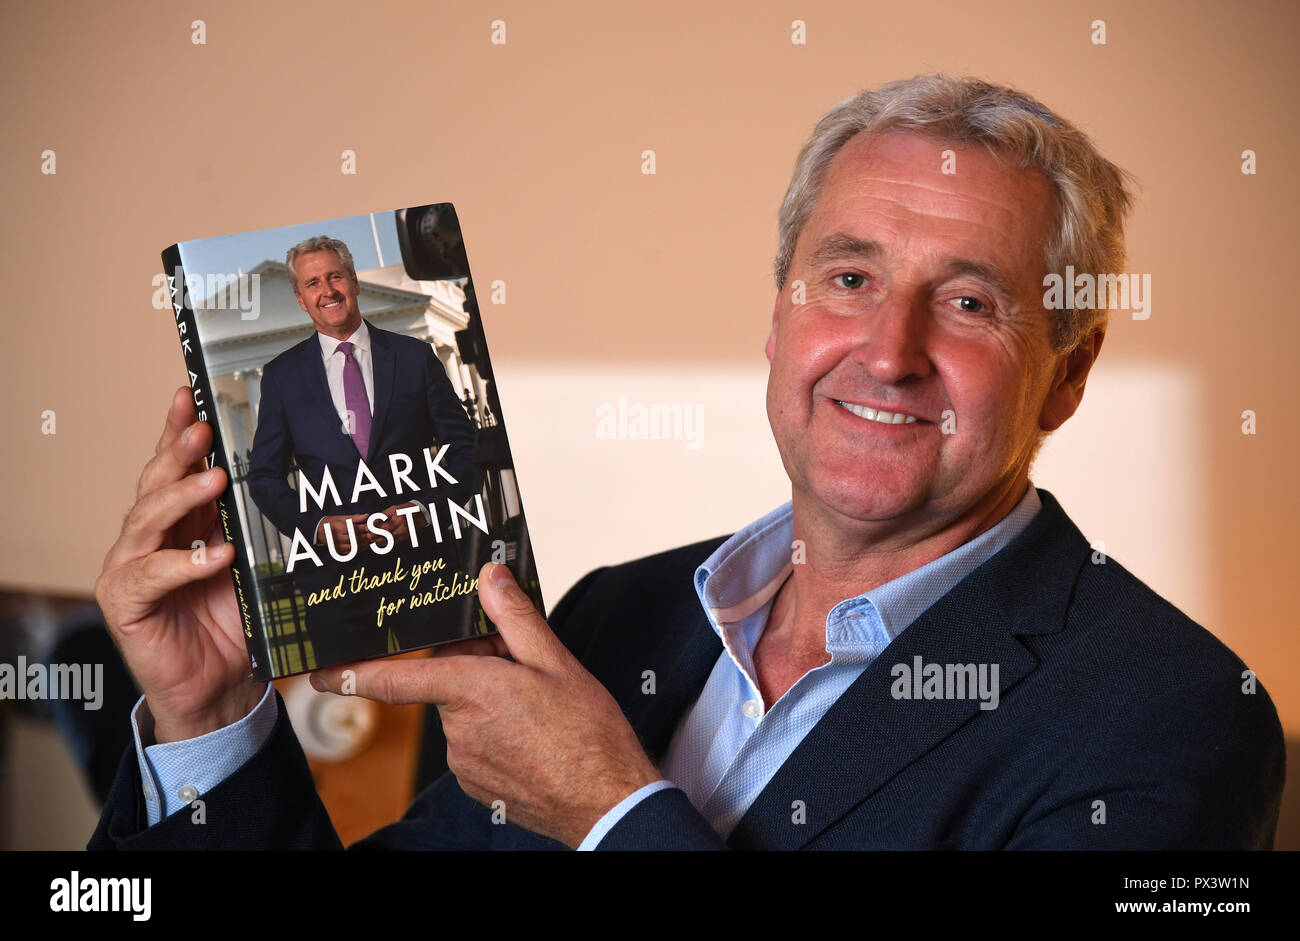 Mark Austin at Dorchester Literary Festival, Mark Austin, English journalist and television presenter, Credit: Finnbarr Webster/Alamy Live News - Stock Image